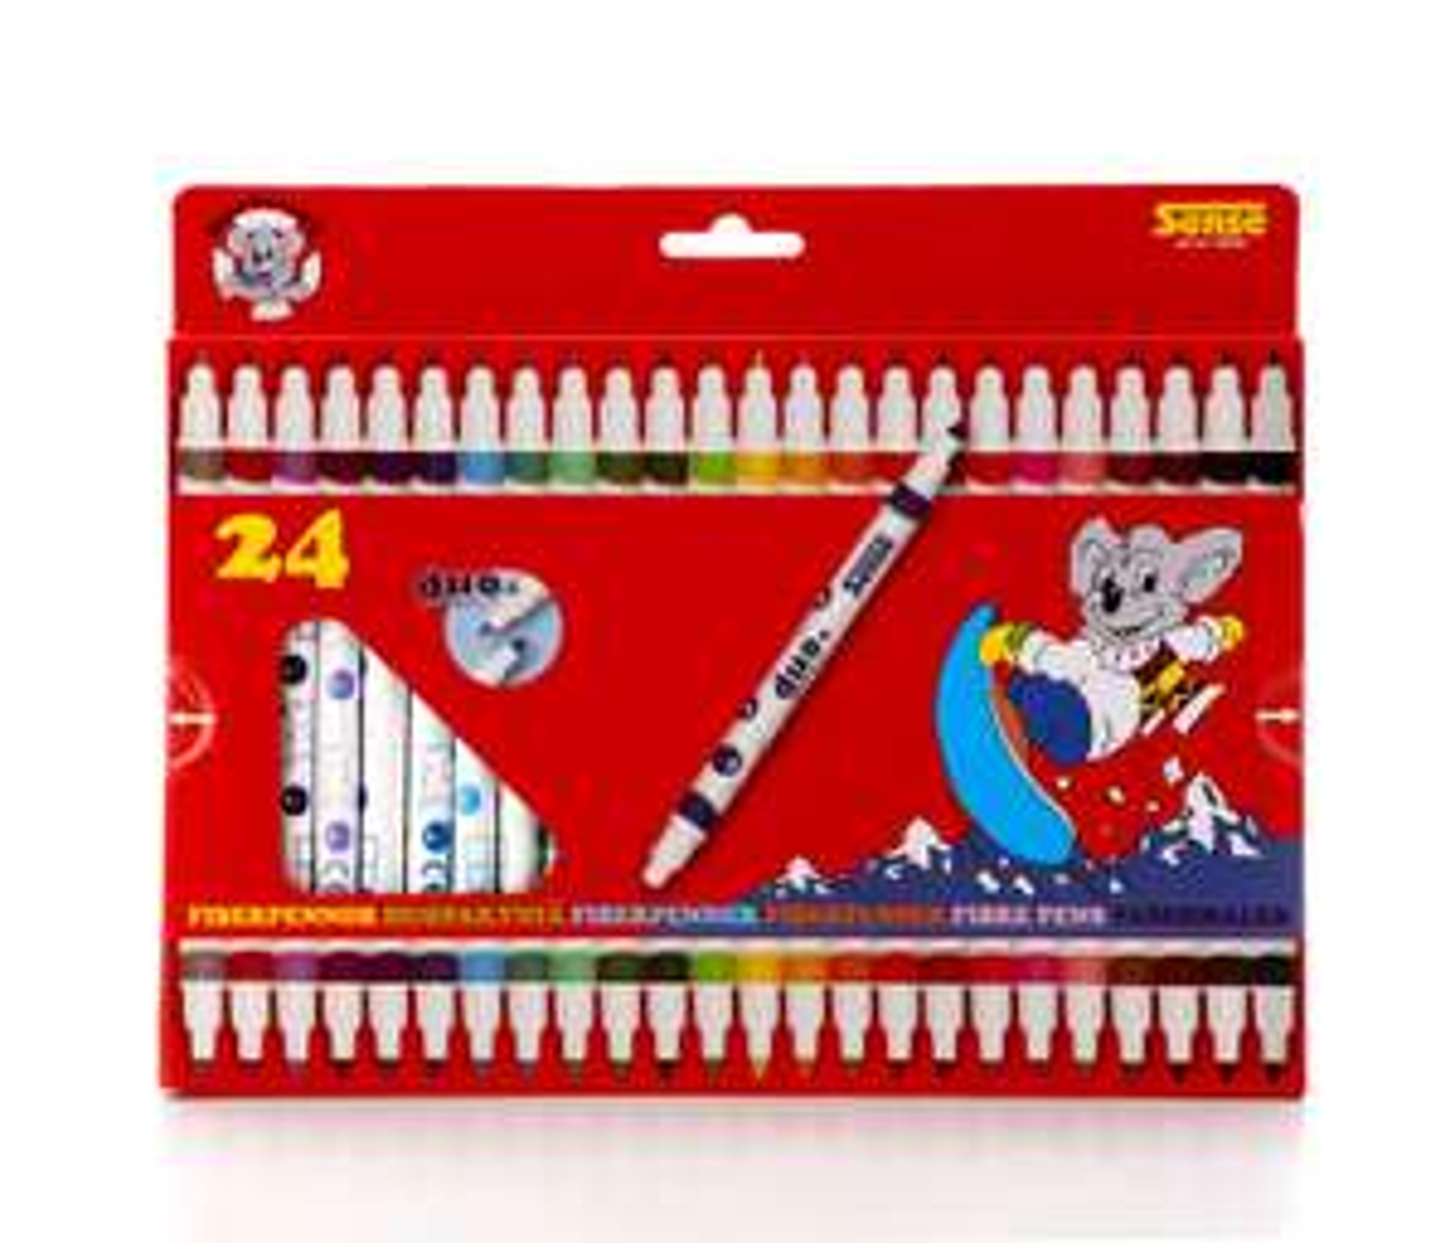 Sense 10308 Dual Tip Washable Felt Tip Colouring Pens for Kids and Children, Set of 24 Colours £1.99 (Prime) £6.48 (Non-Prime) @ Amazon